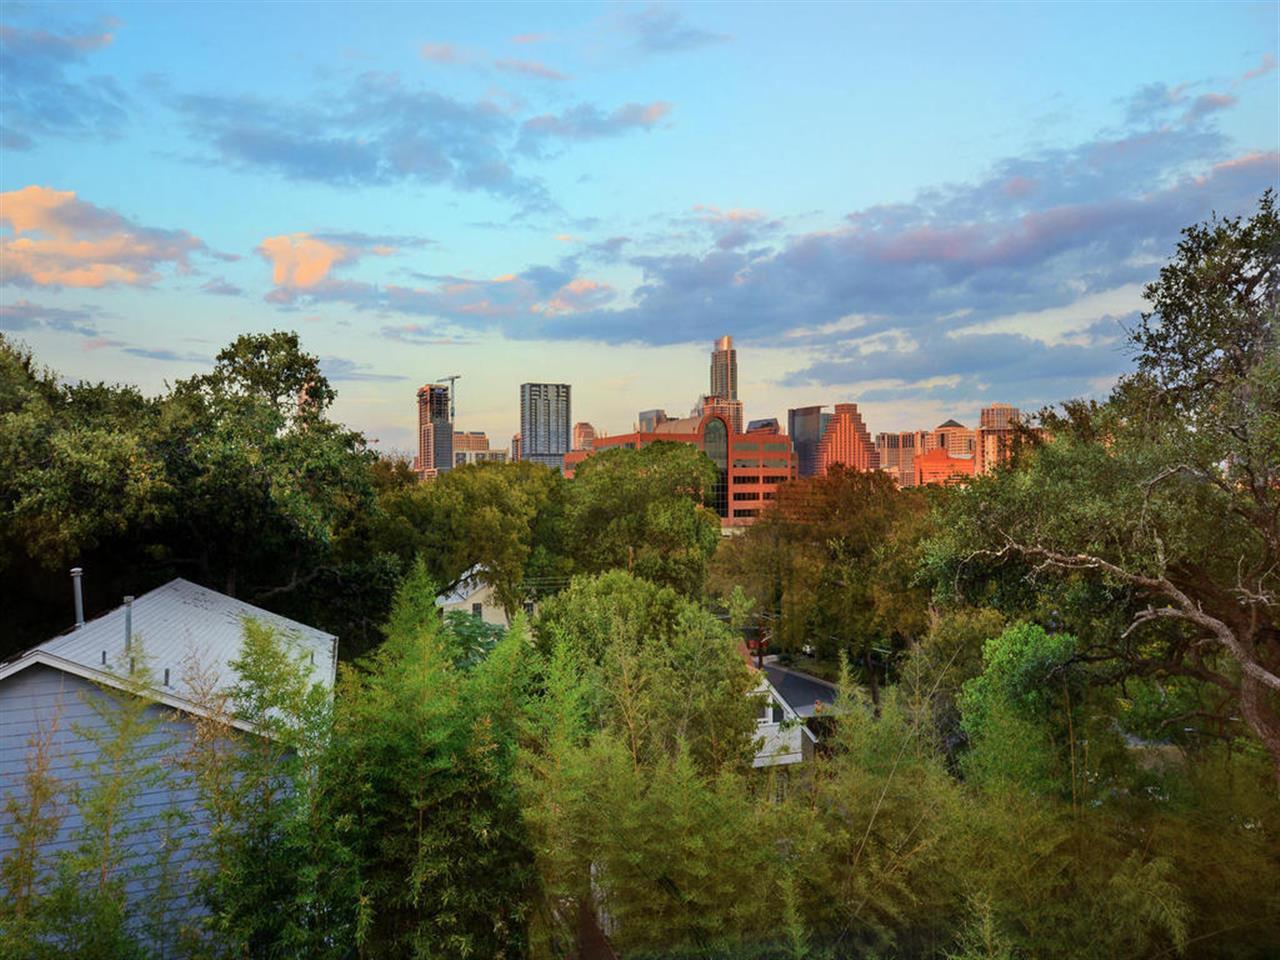 Bouldin Hilltop view of downtown Austin, TX